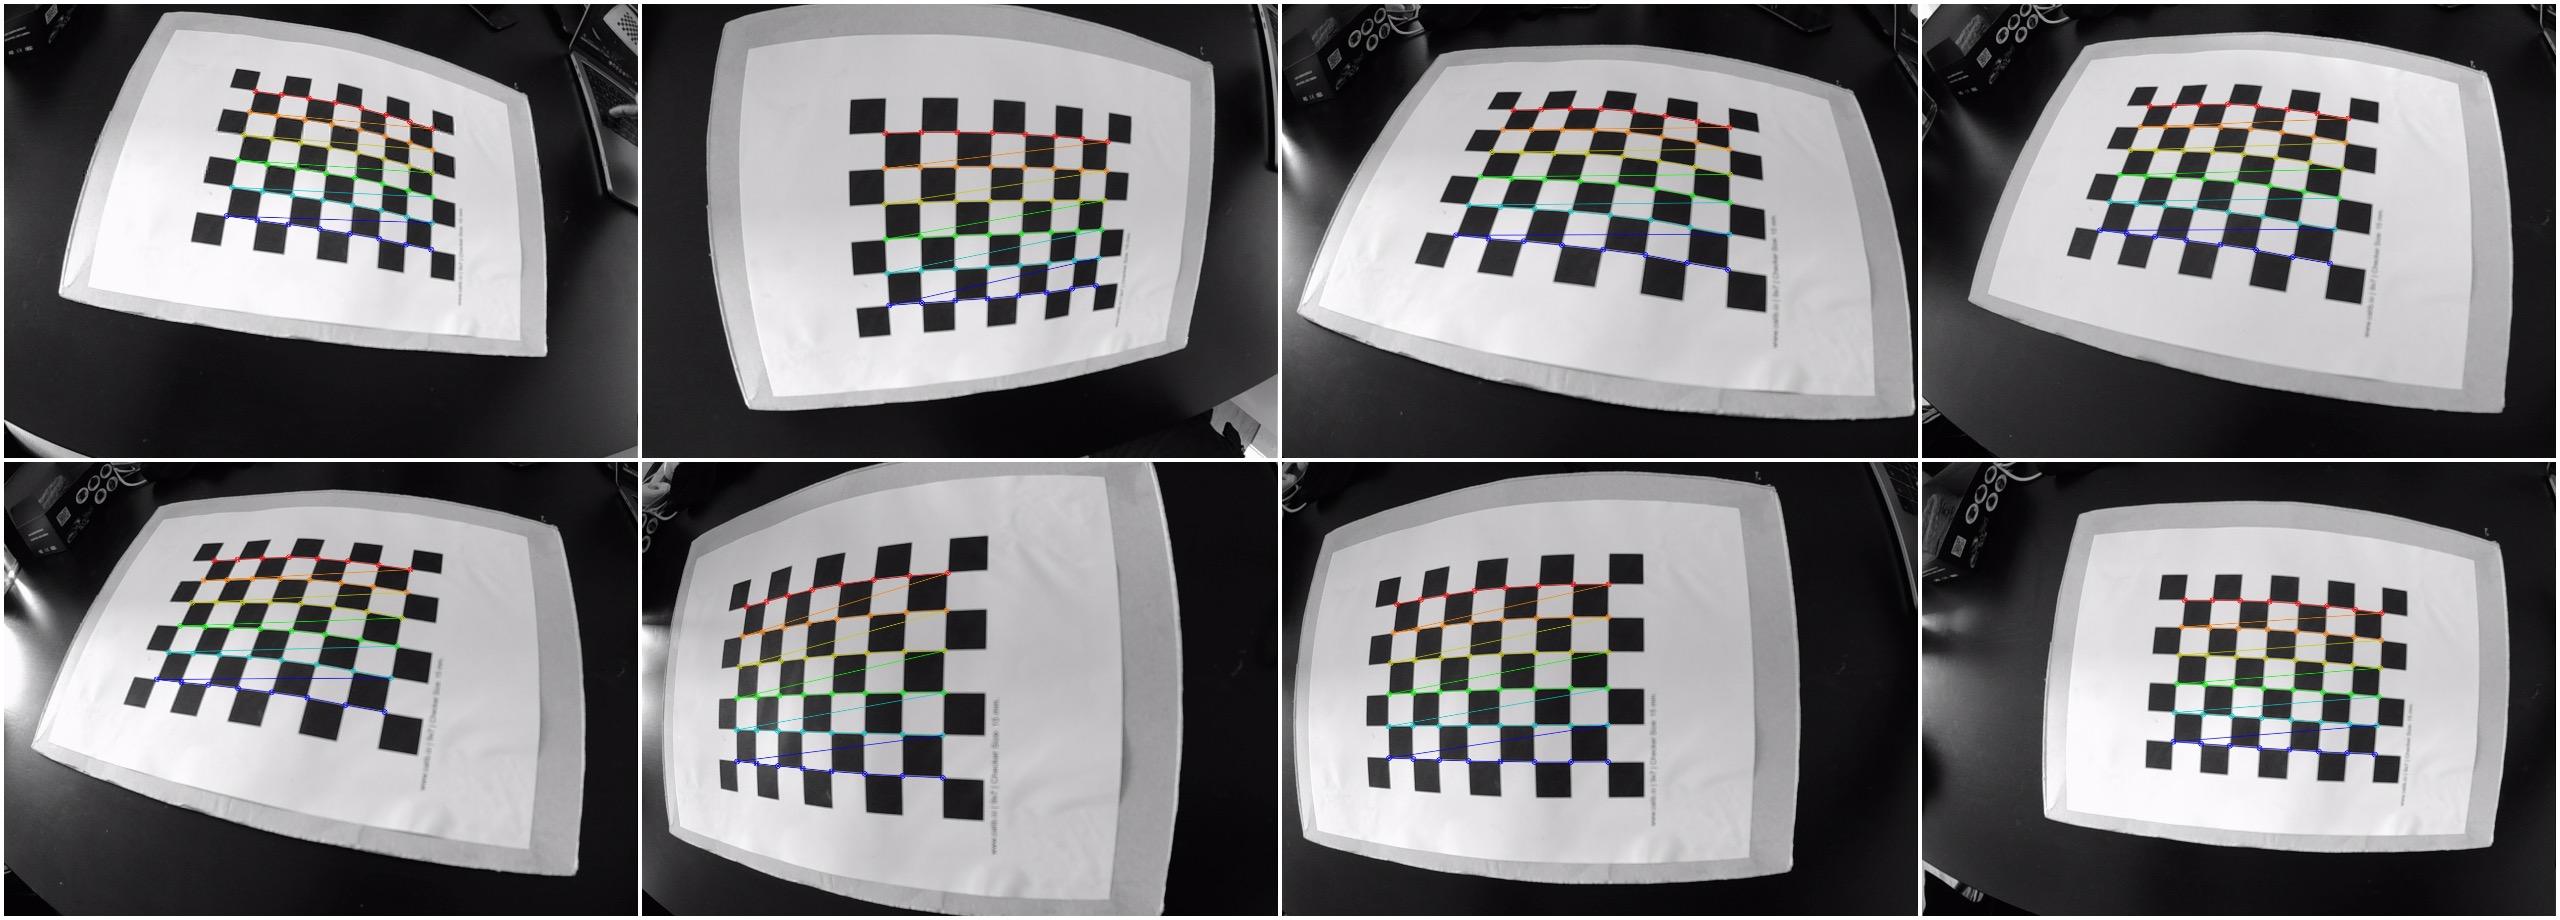 Detected chessboard corners